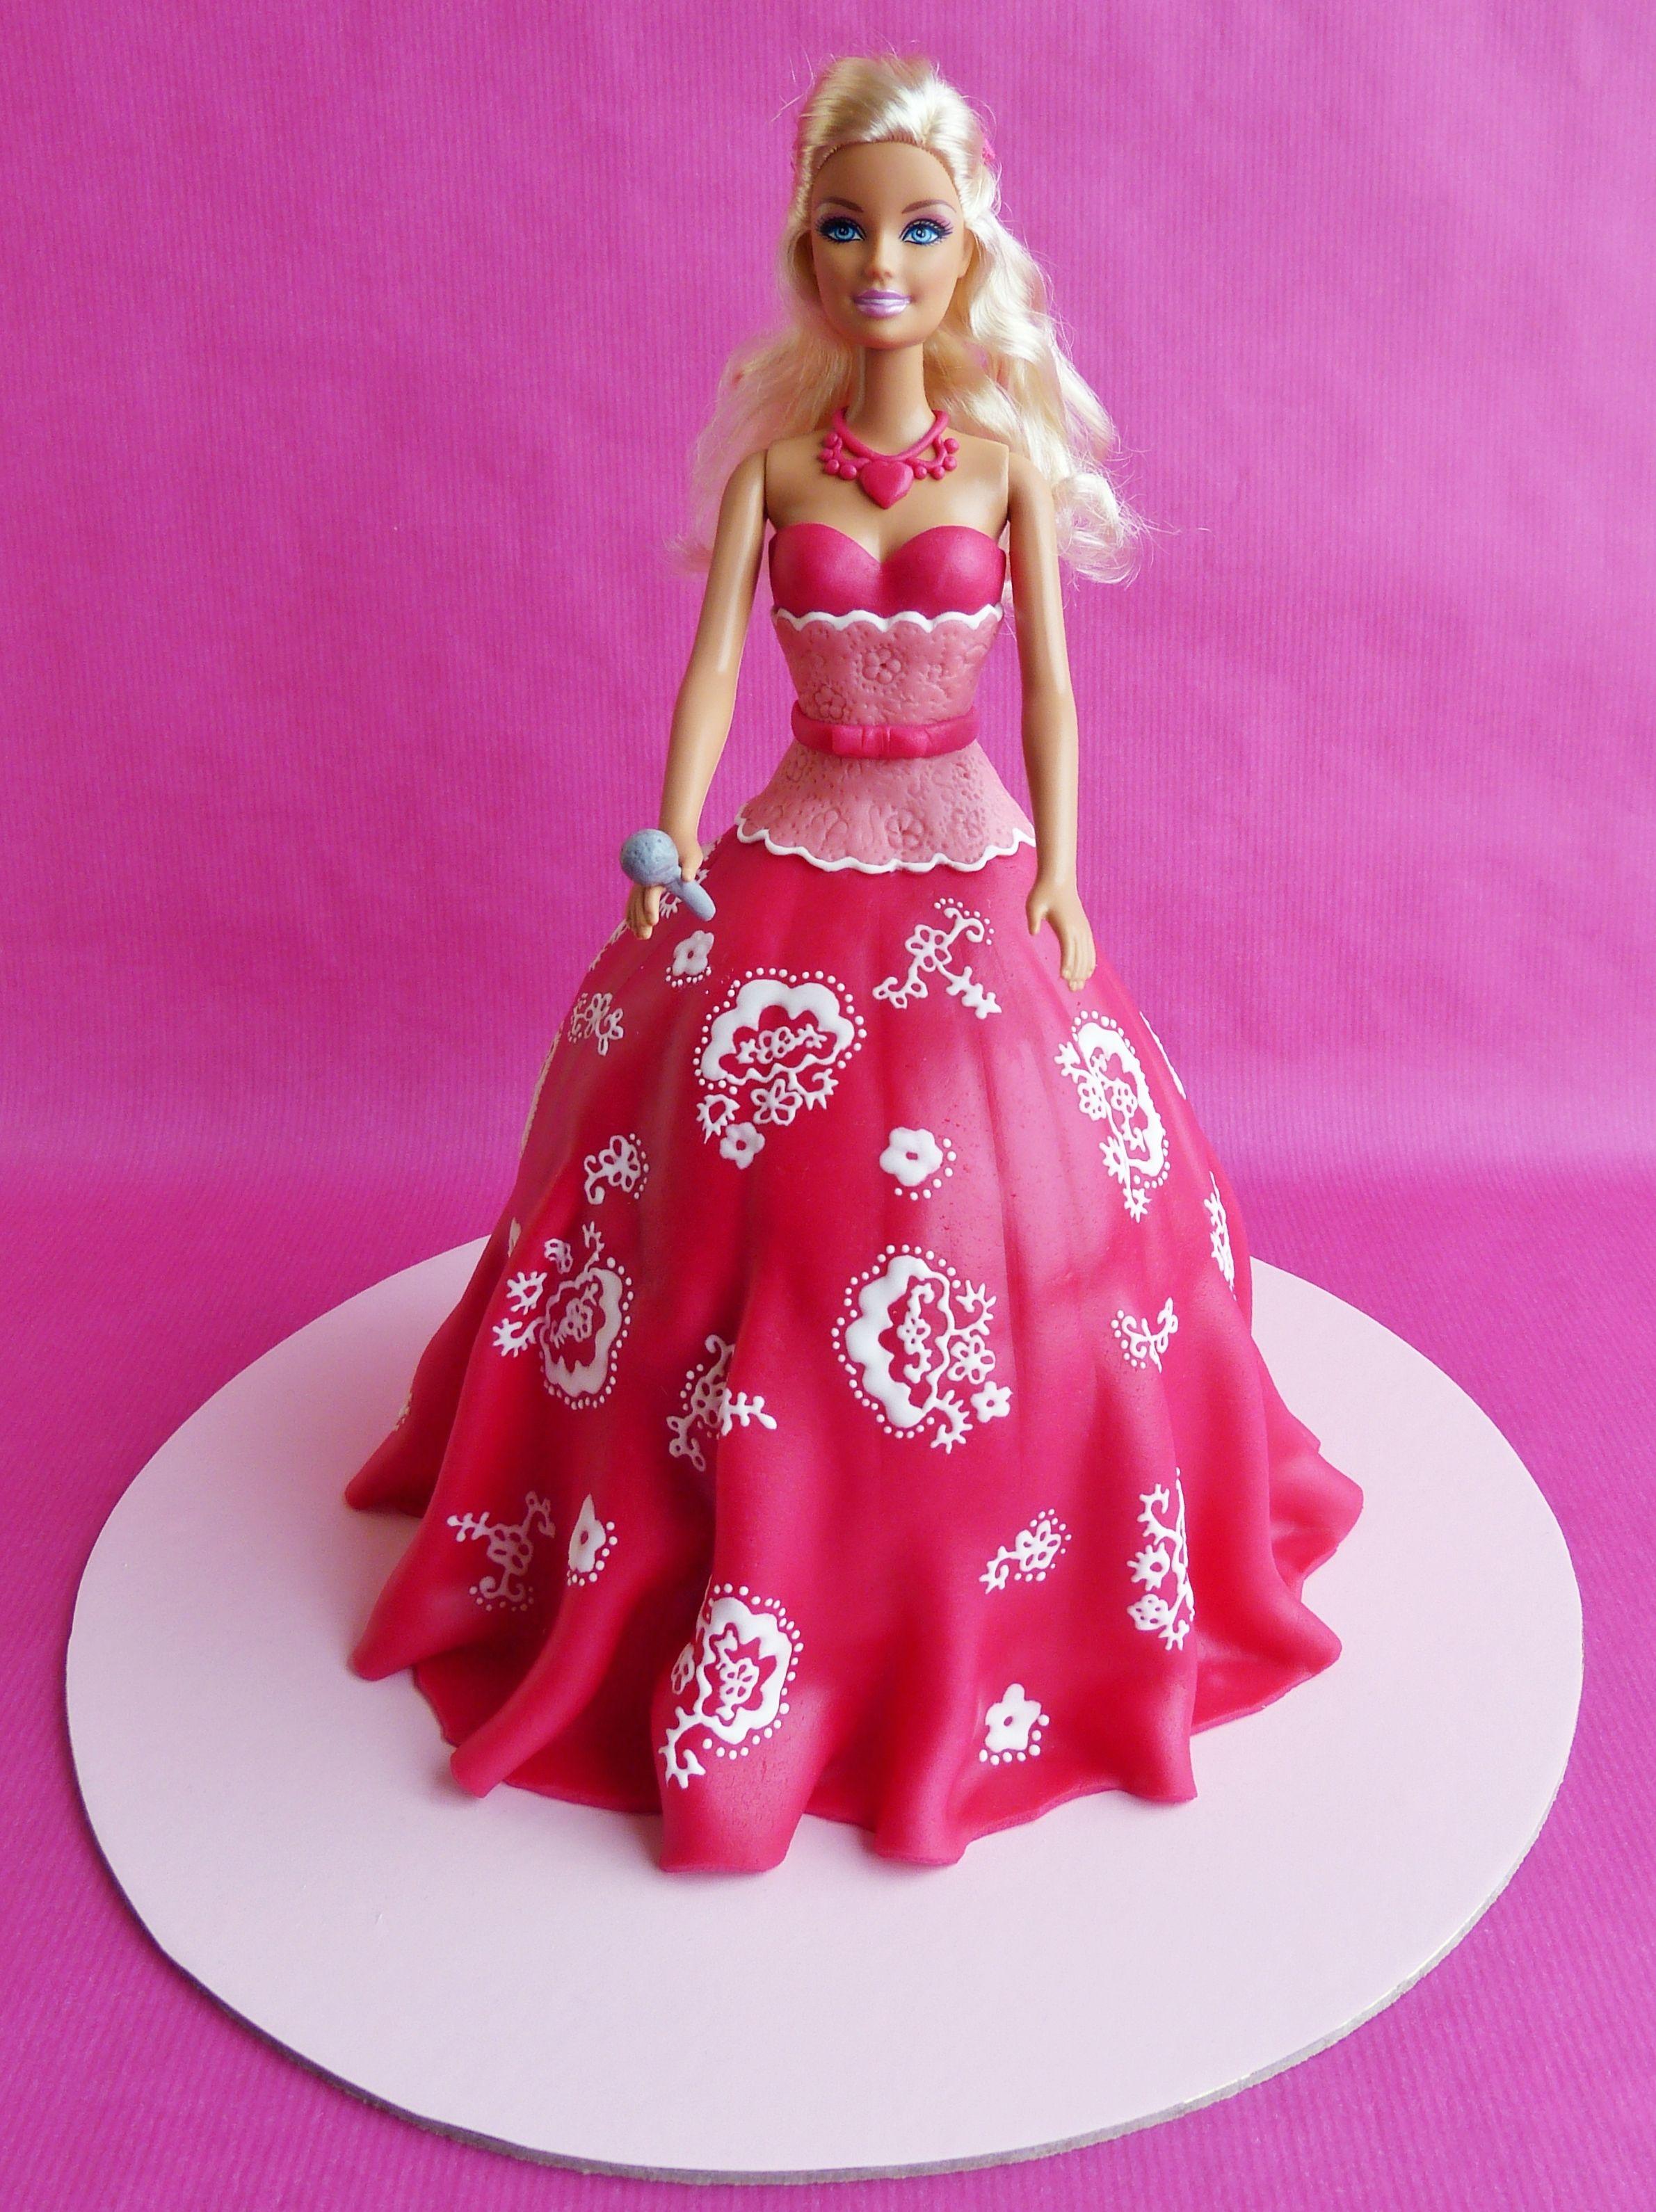 Barbie Cakes Barbie Pop Star Cake  Childrens Birthday Cakes - Birthday cake doll princess